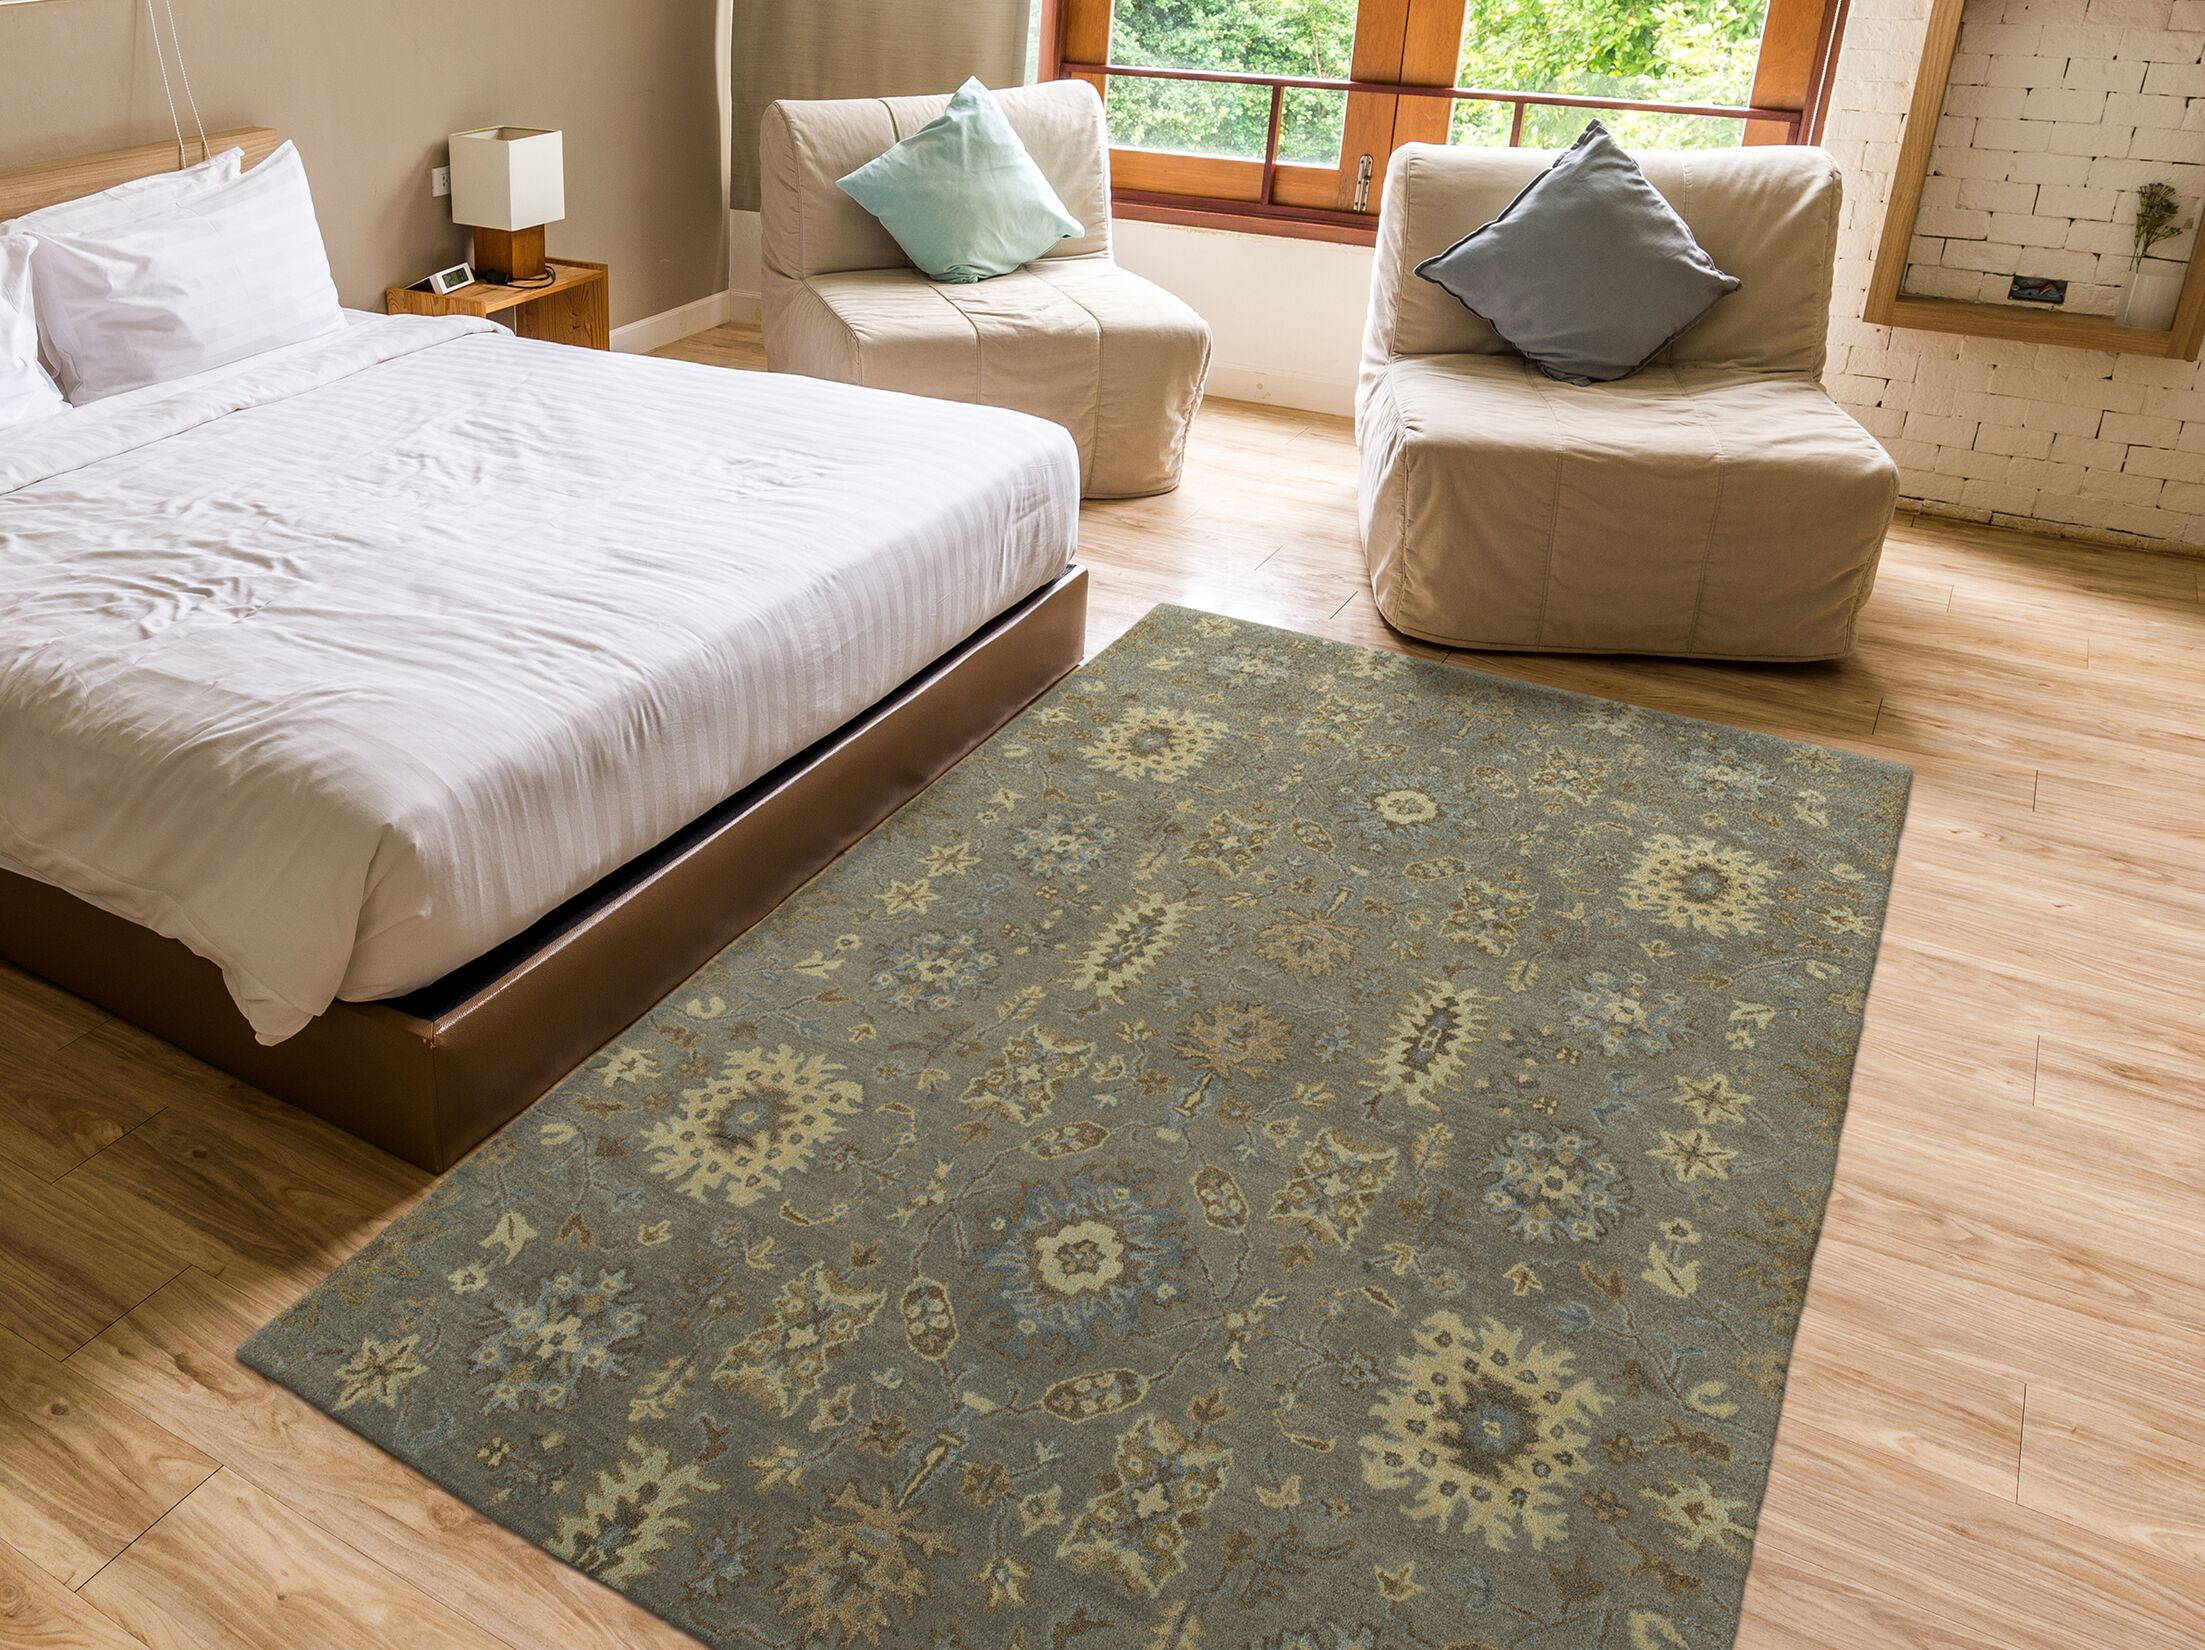 Romarin Hand-Tufted Wool Mushroom Area Rug Rug Size: Rectangle 5' x 7'9